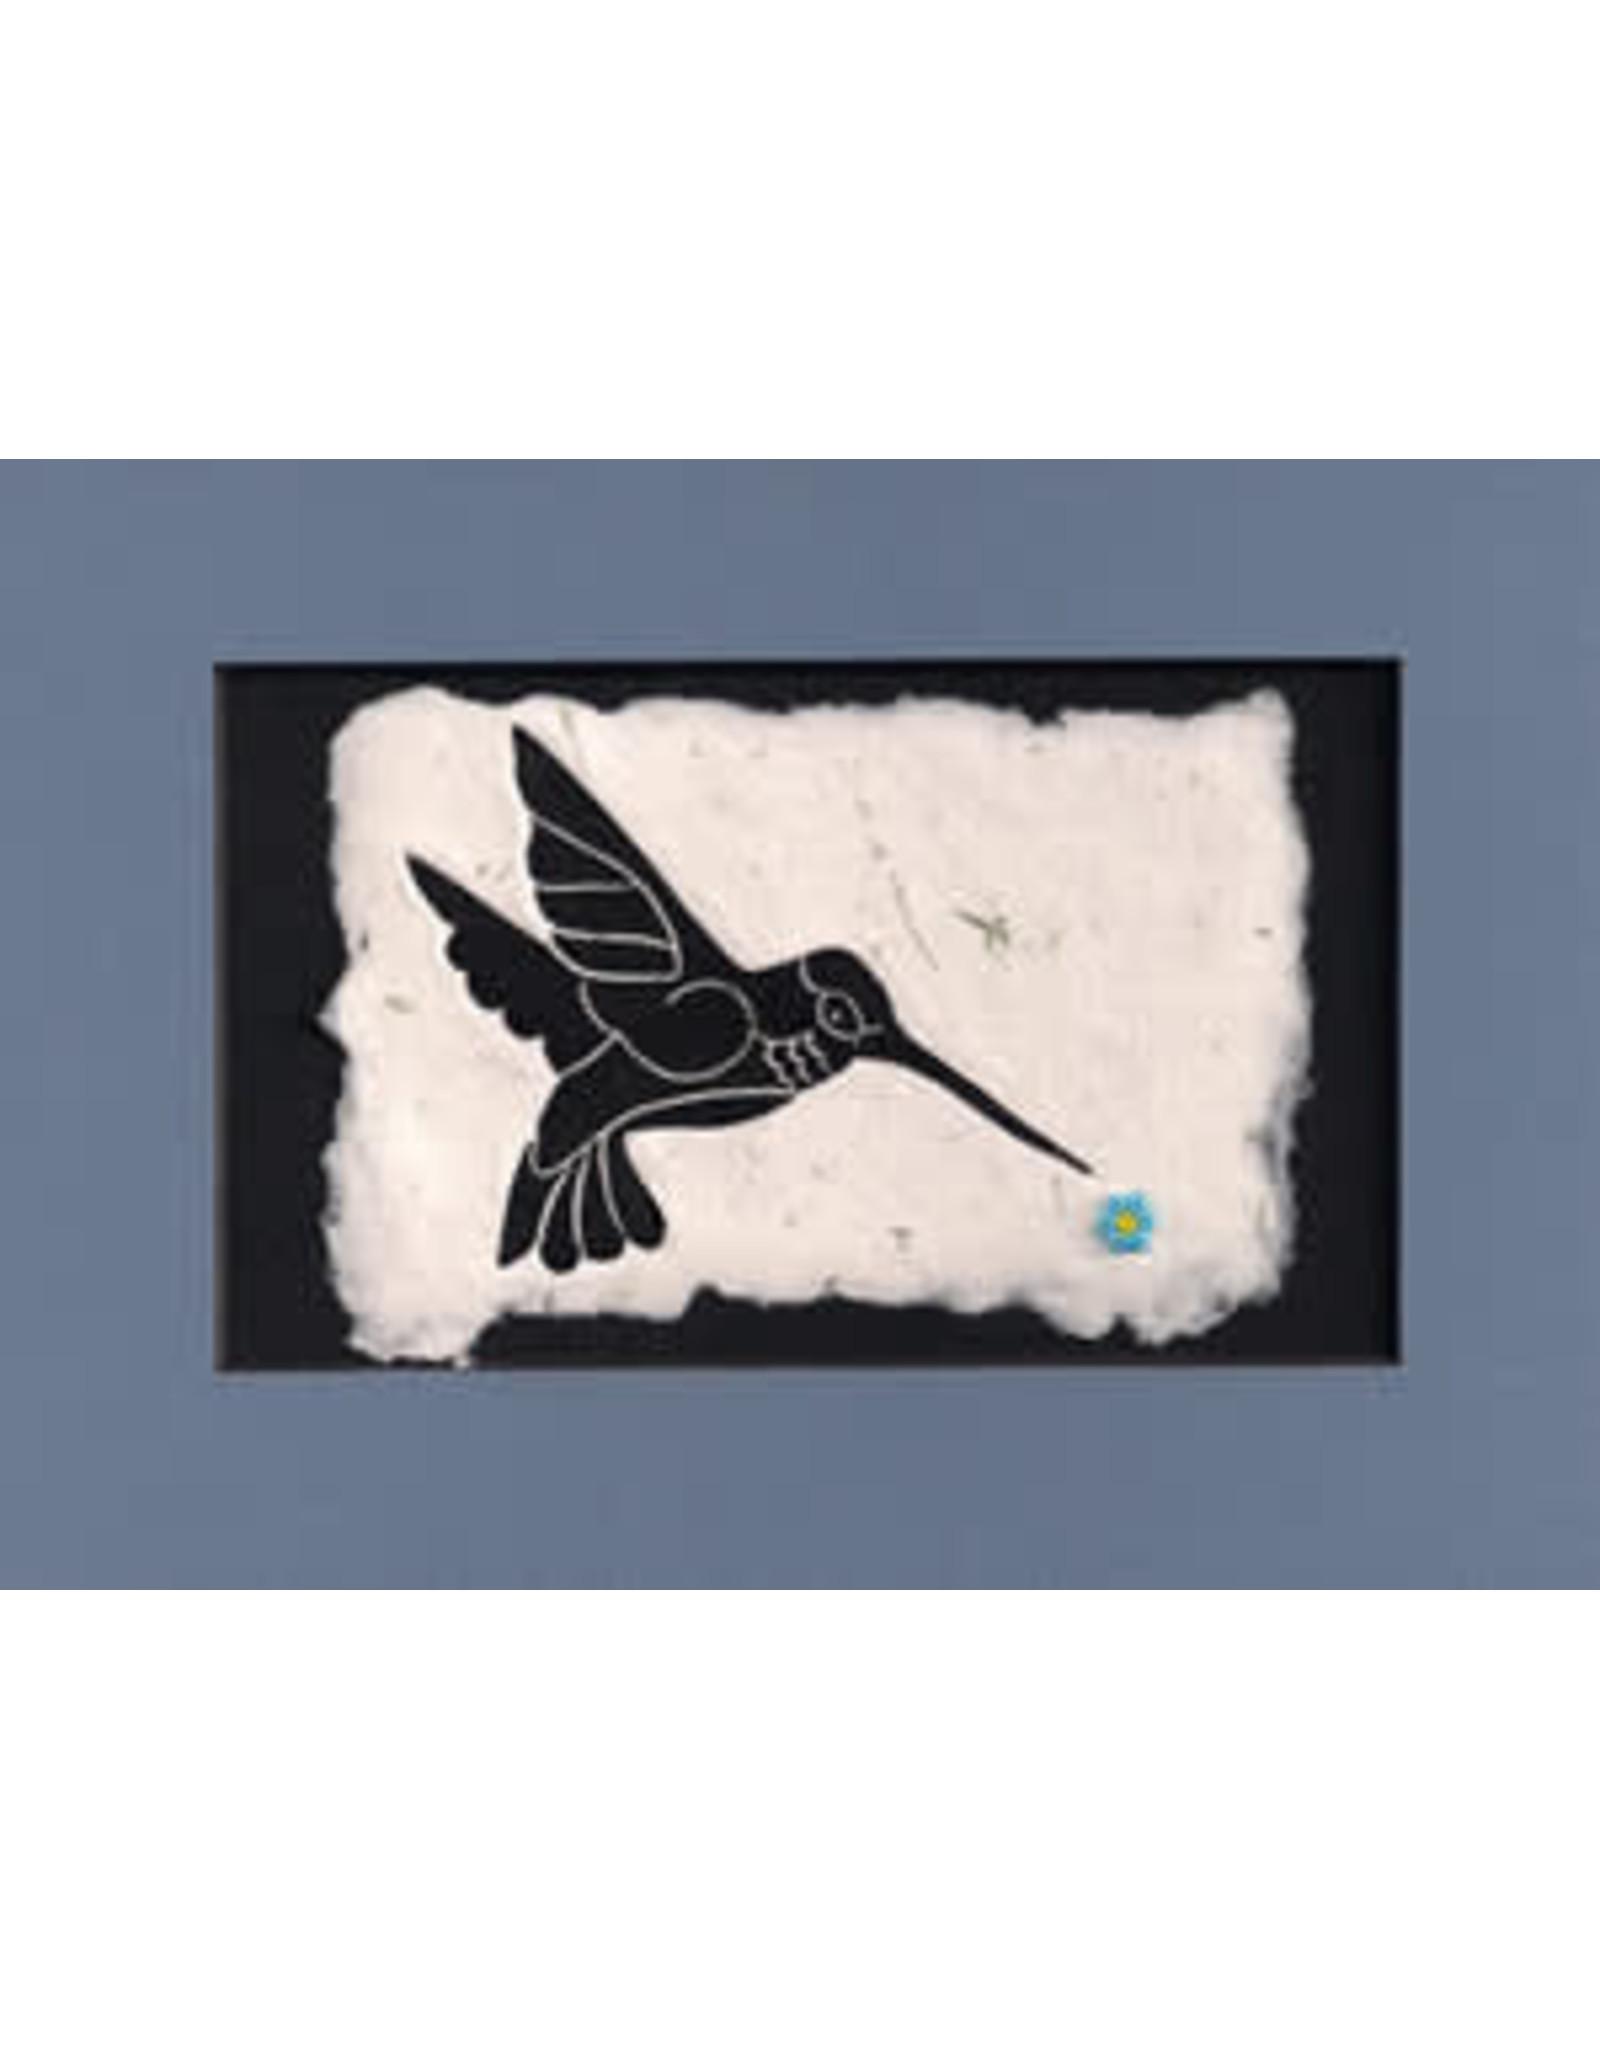 KB's Handmade Creations Hummingbird | Karen Beason